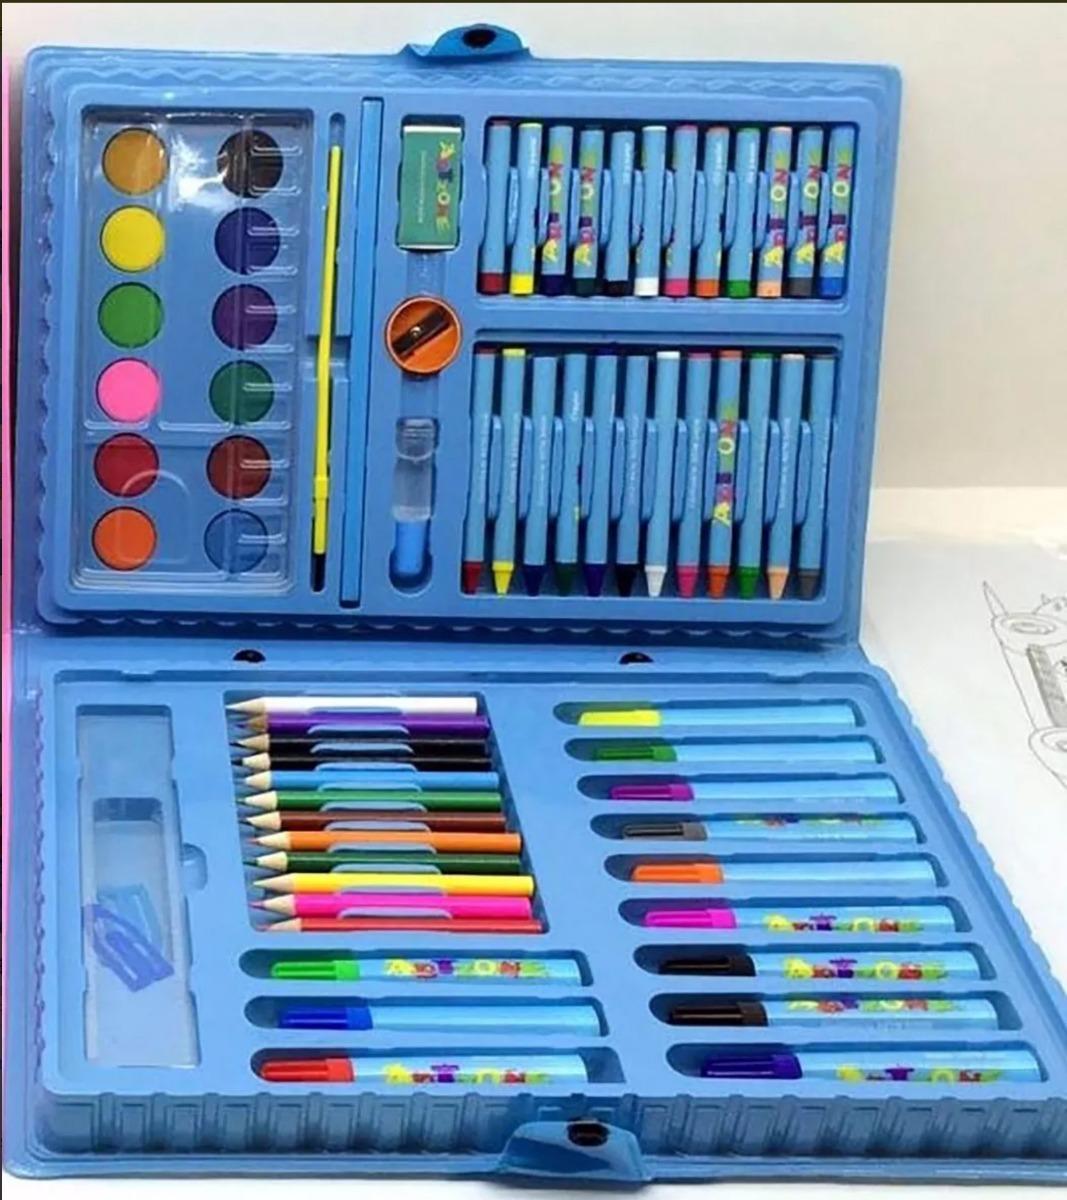 d6de013ee 15 Estojo Maleta Escolar pintura 68 Peças Personalizado - R  419